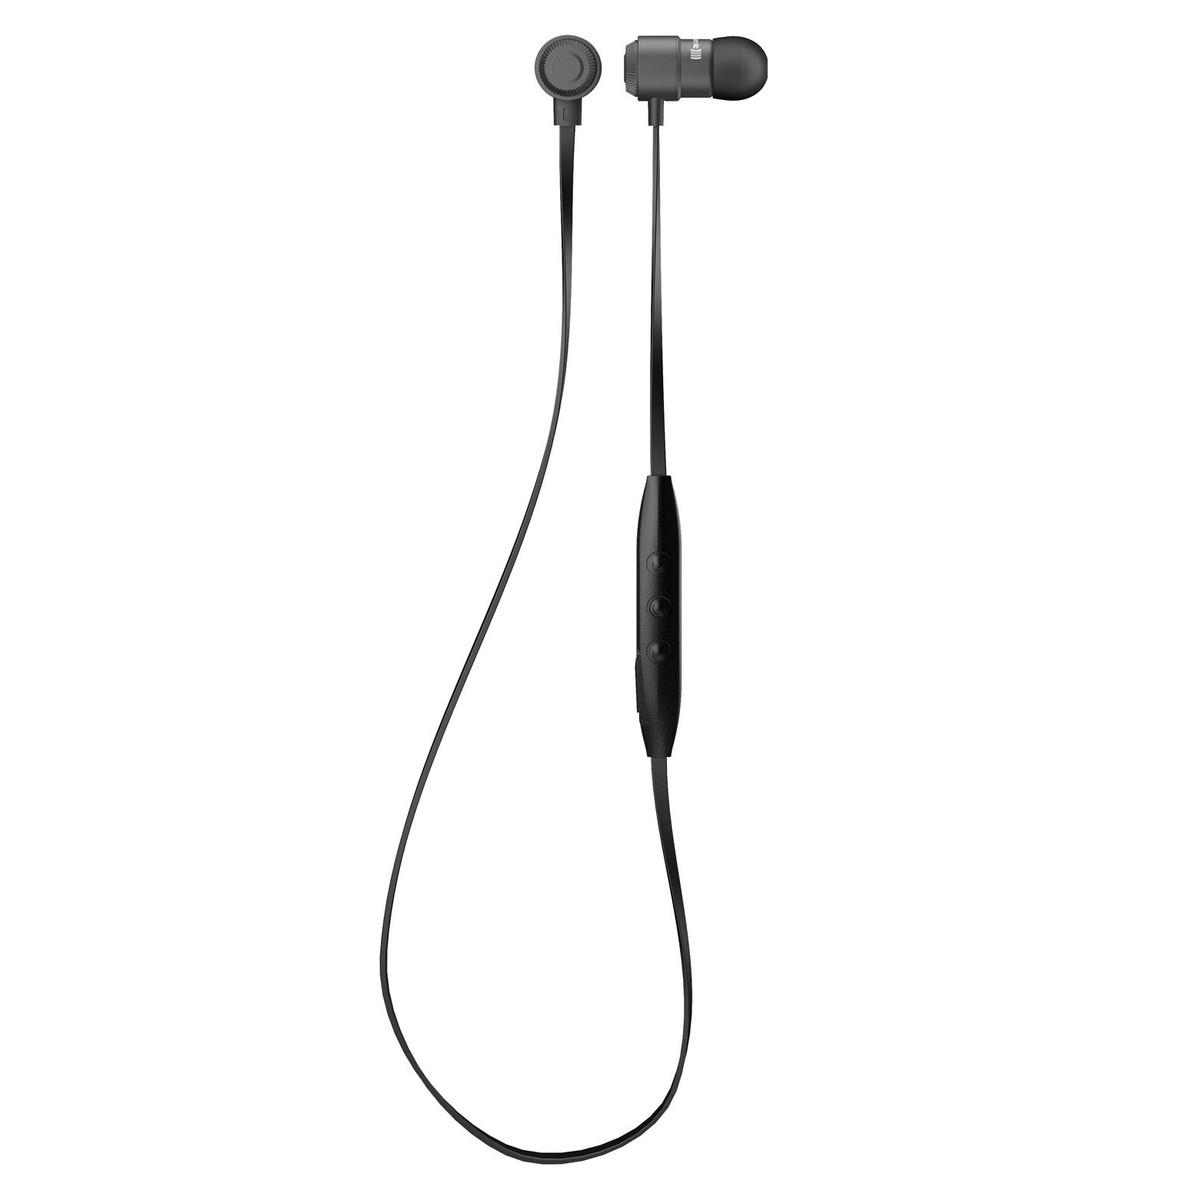 Beyerdynamic Byron BT In-Ear Headphones at Gear4music.com